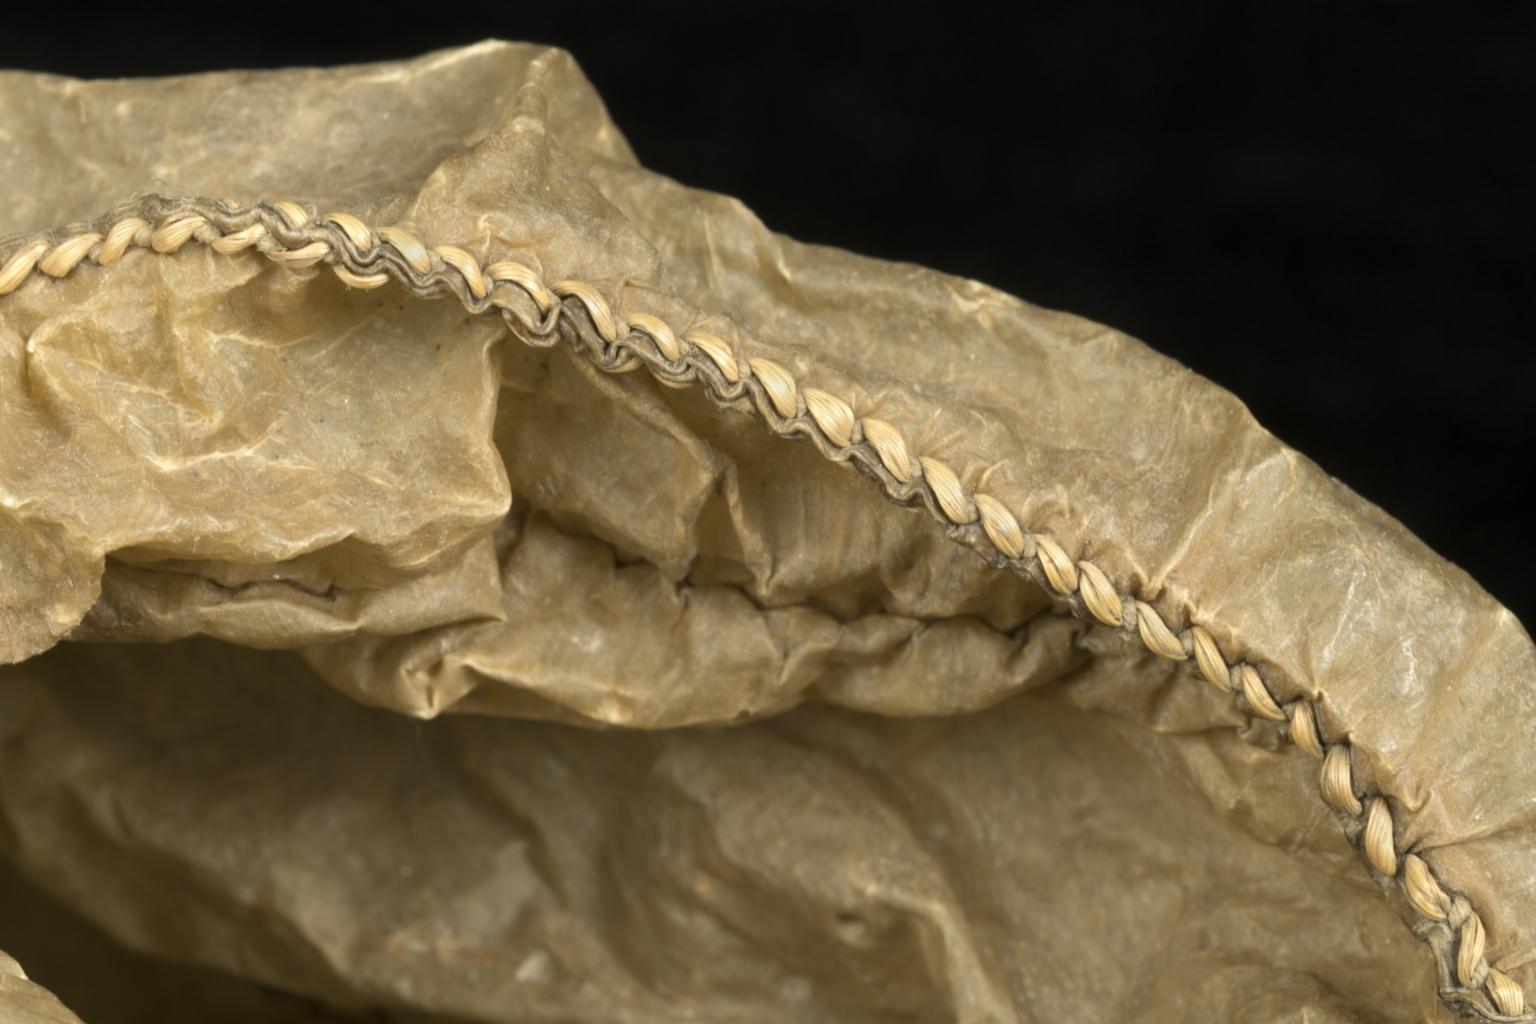 Detail of seal gut parka